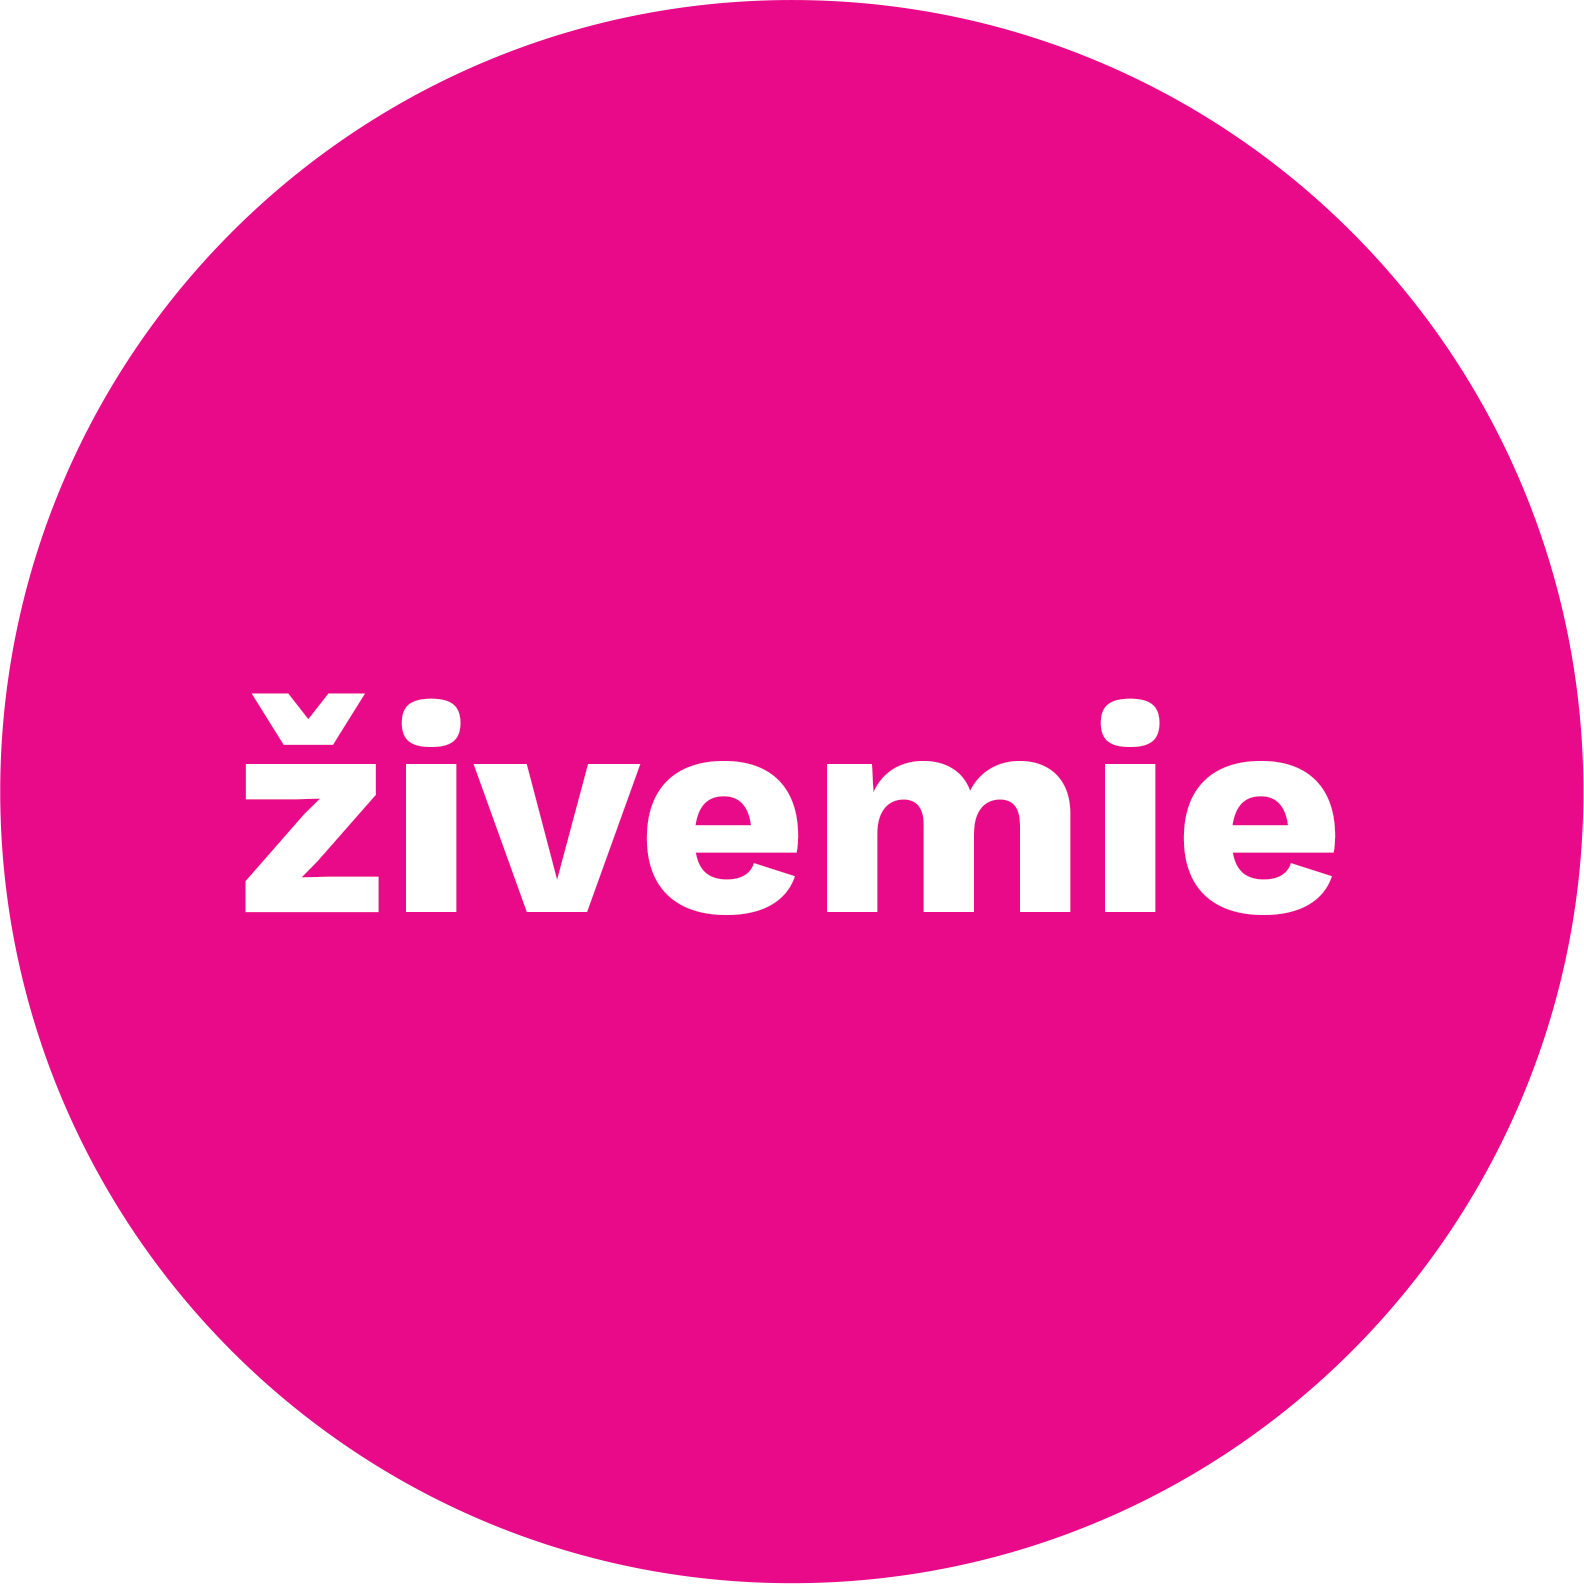 zivemie.cz